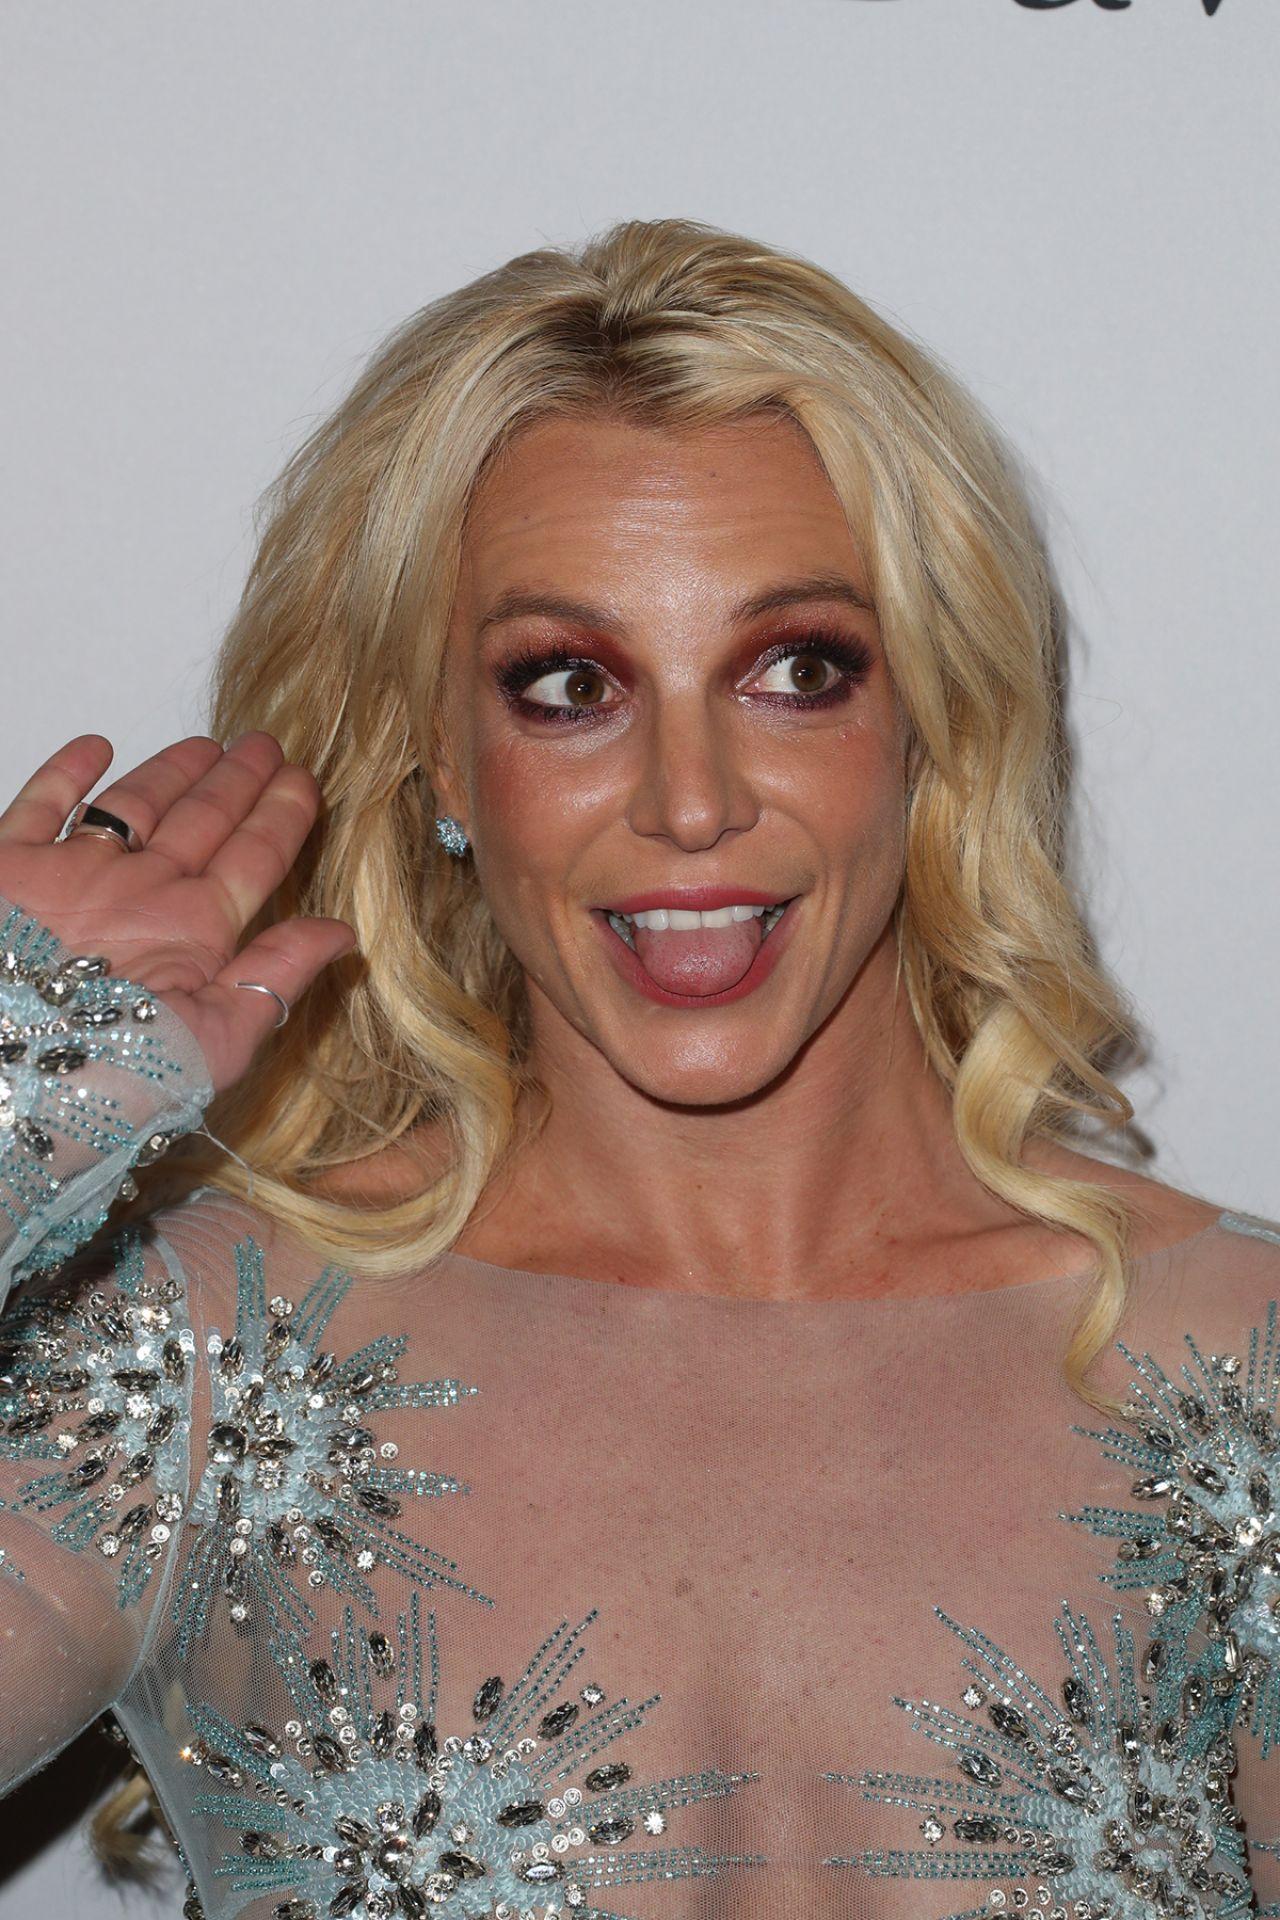 Britney Spears  Clive Davis PreGrammy 2017 Party in Beverly Hills